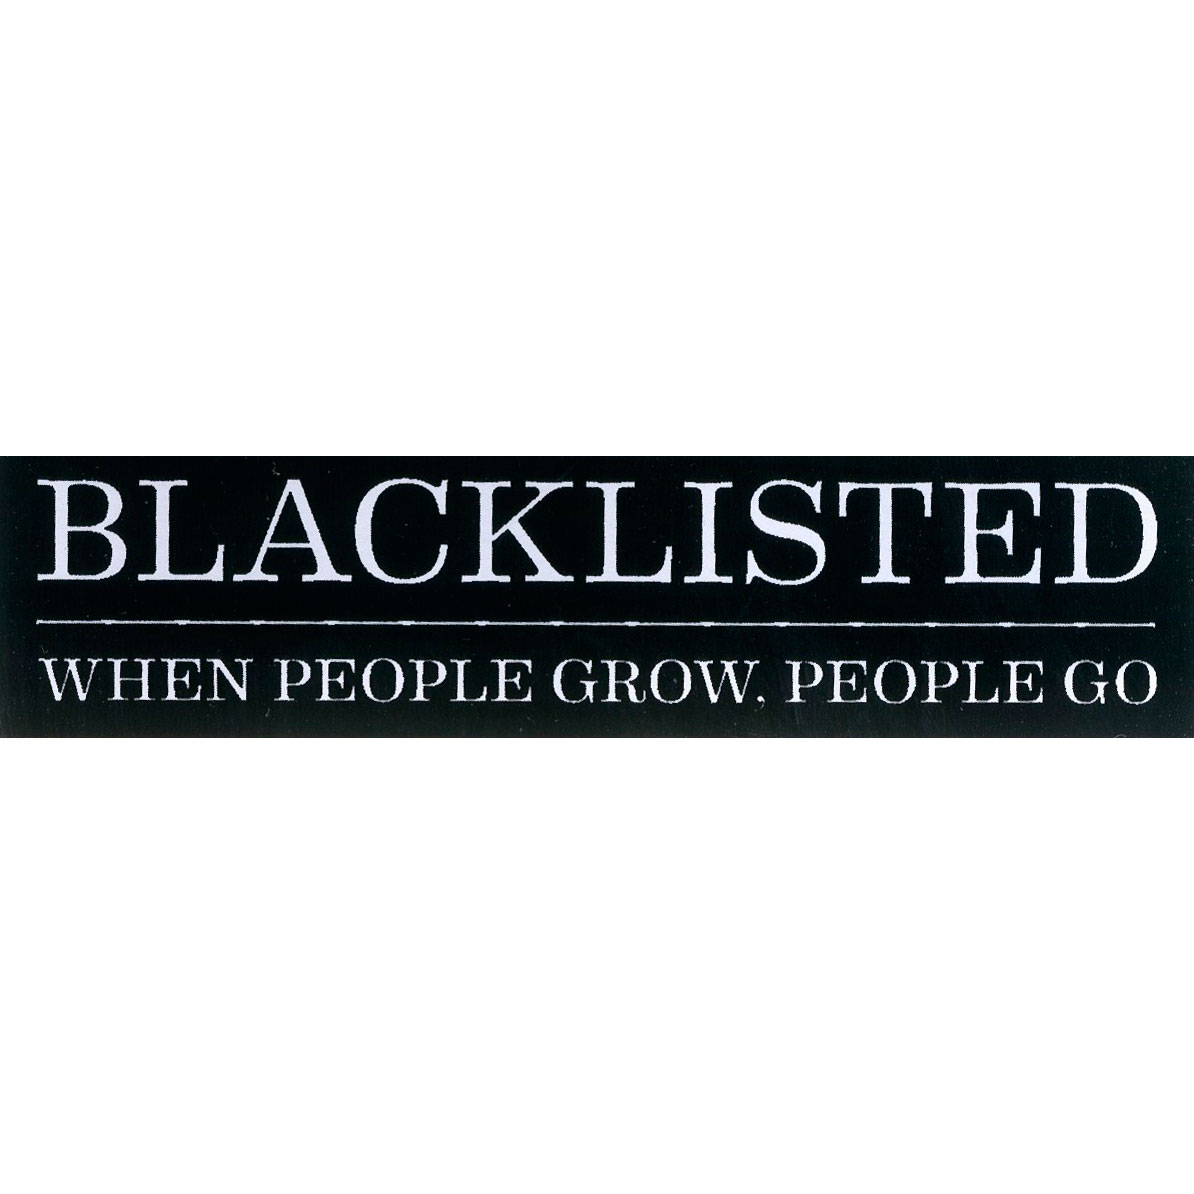 Blacklisted sticker